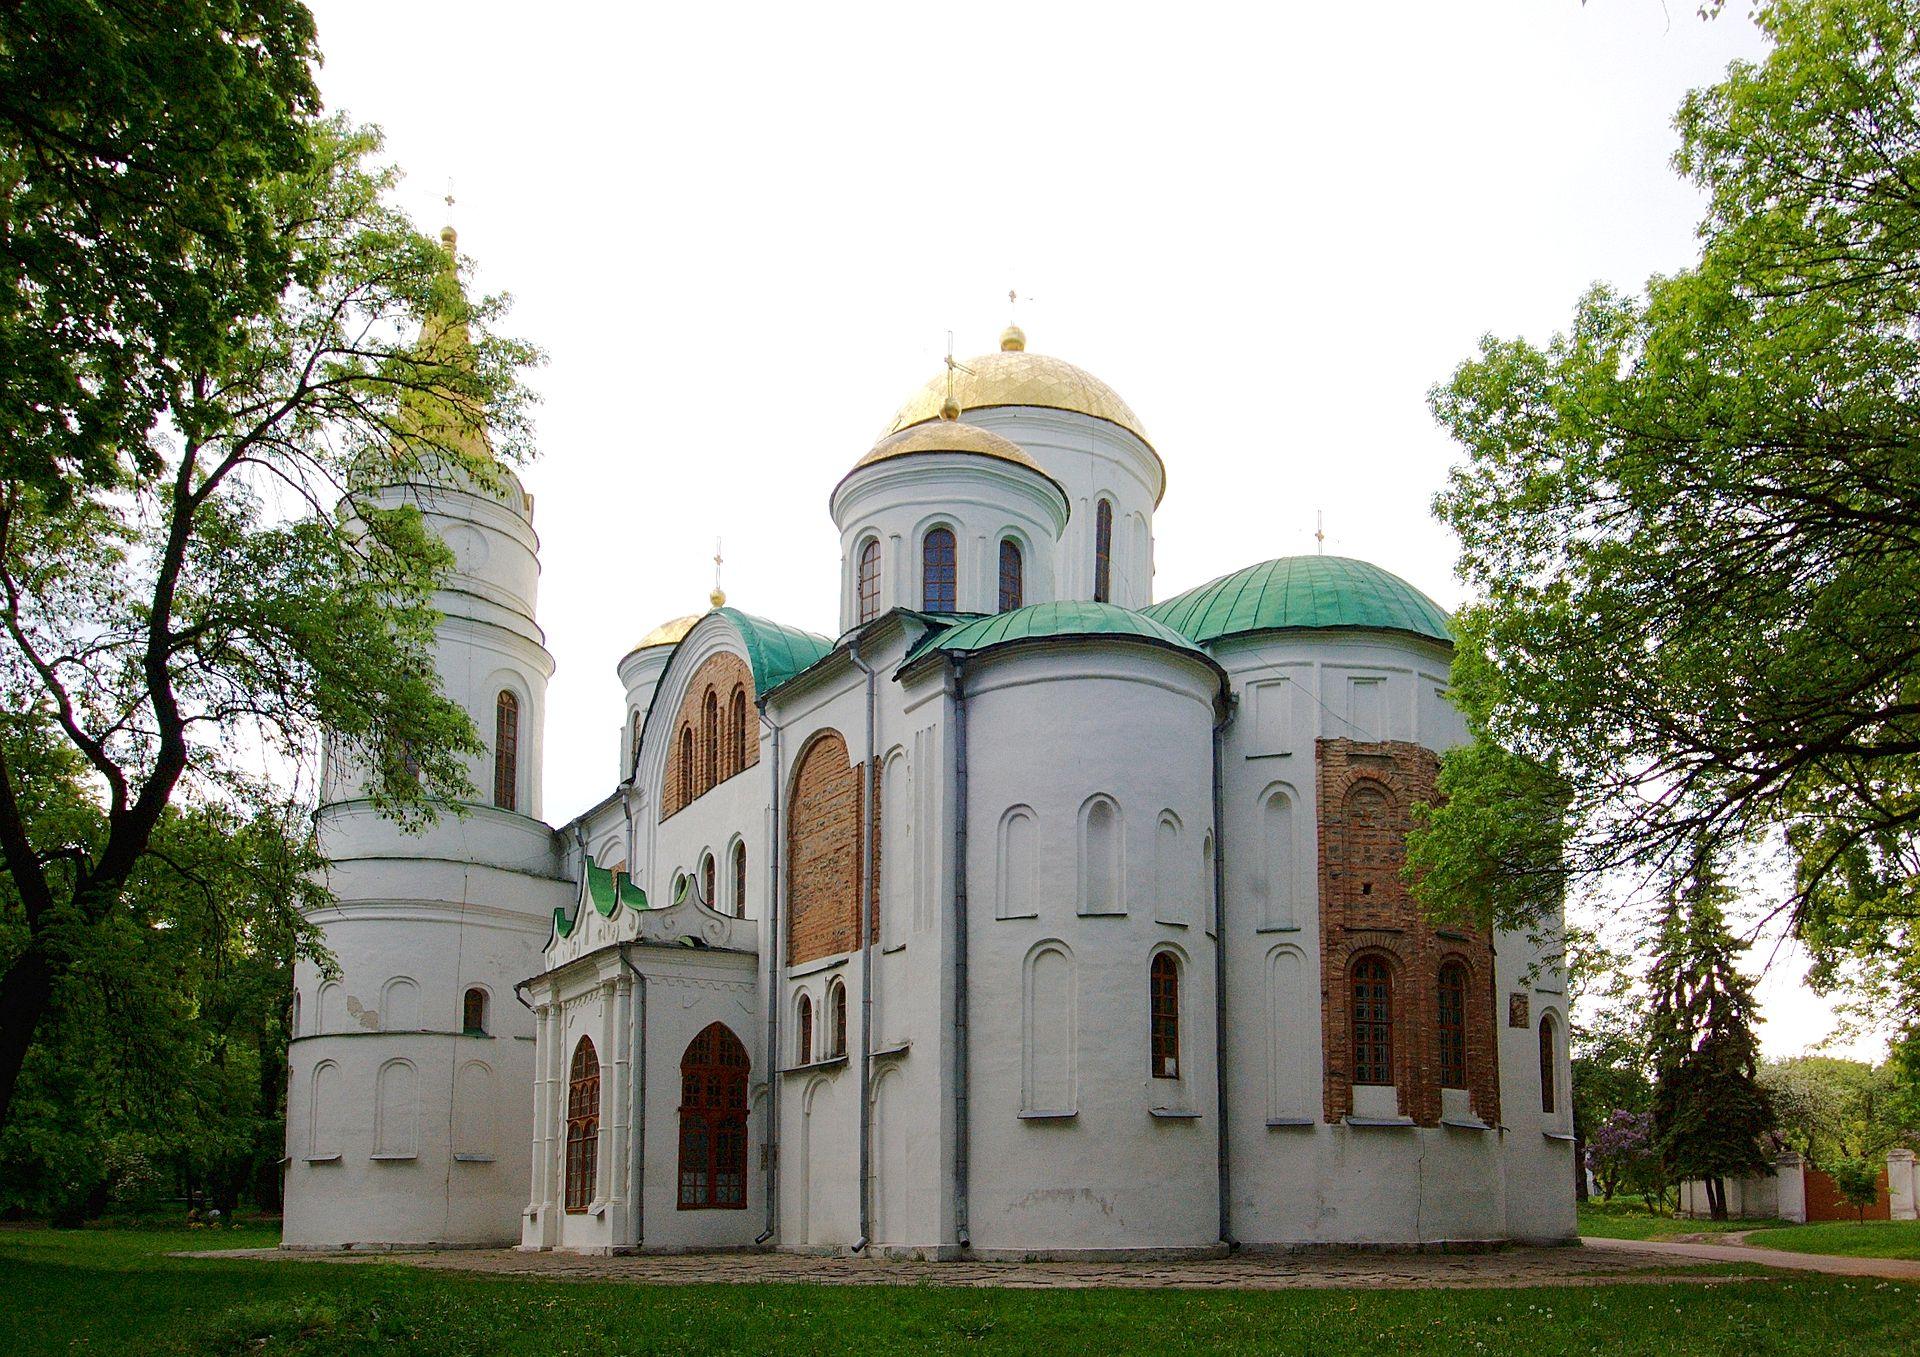 Спасо-Преображенский собор Чернигова. Вид с юго-востока.